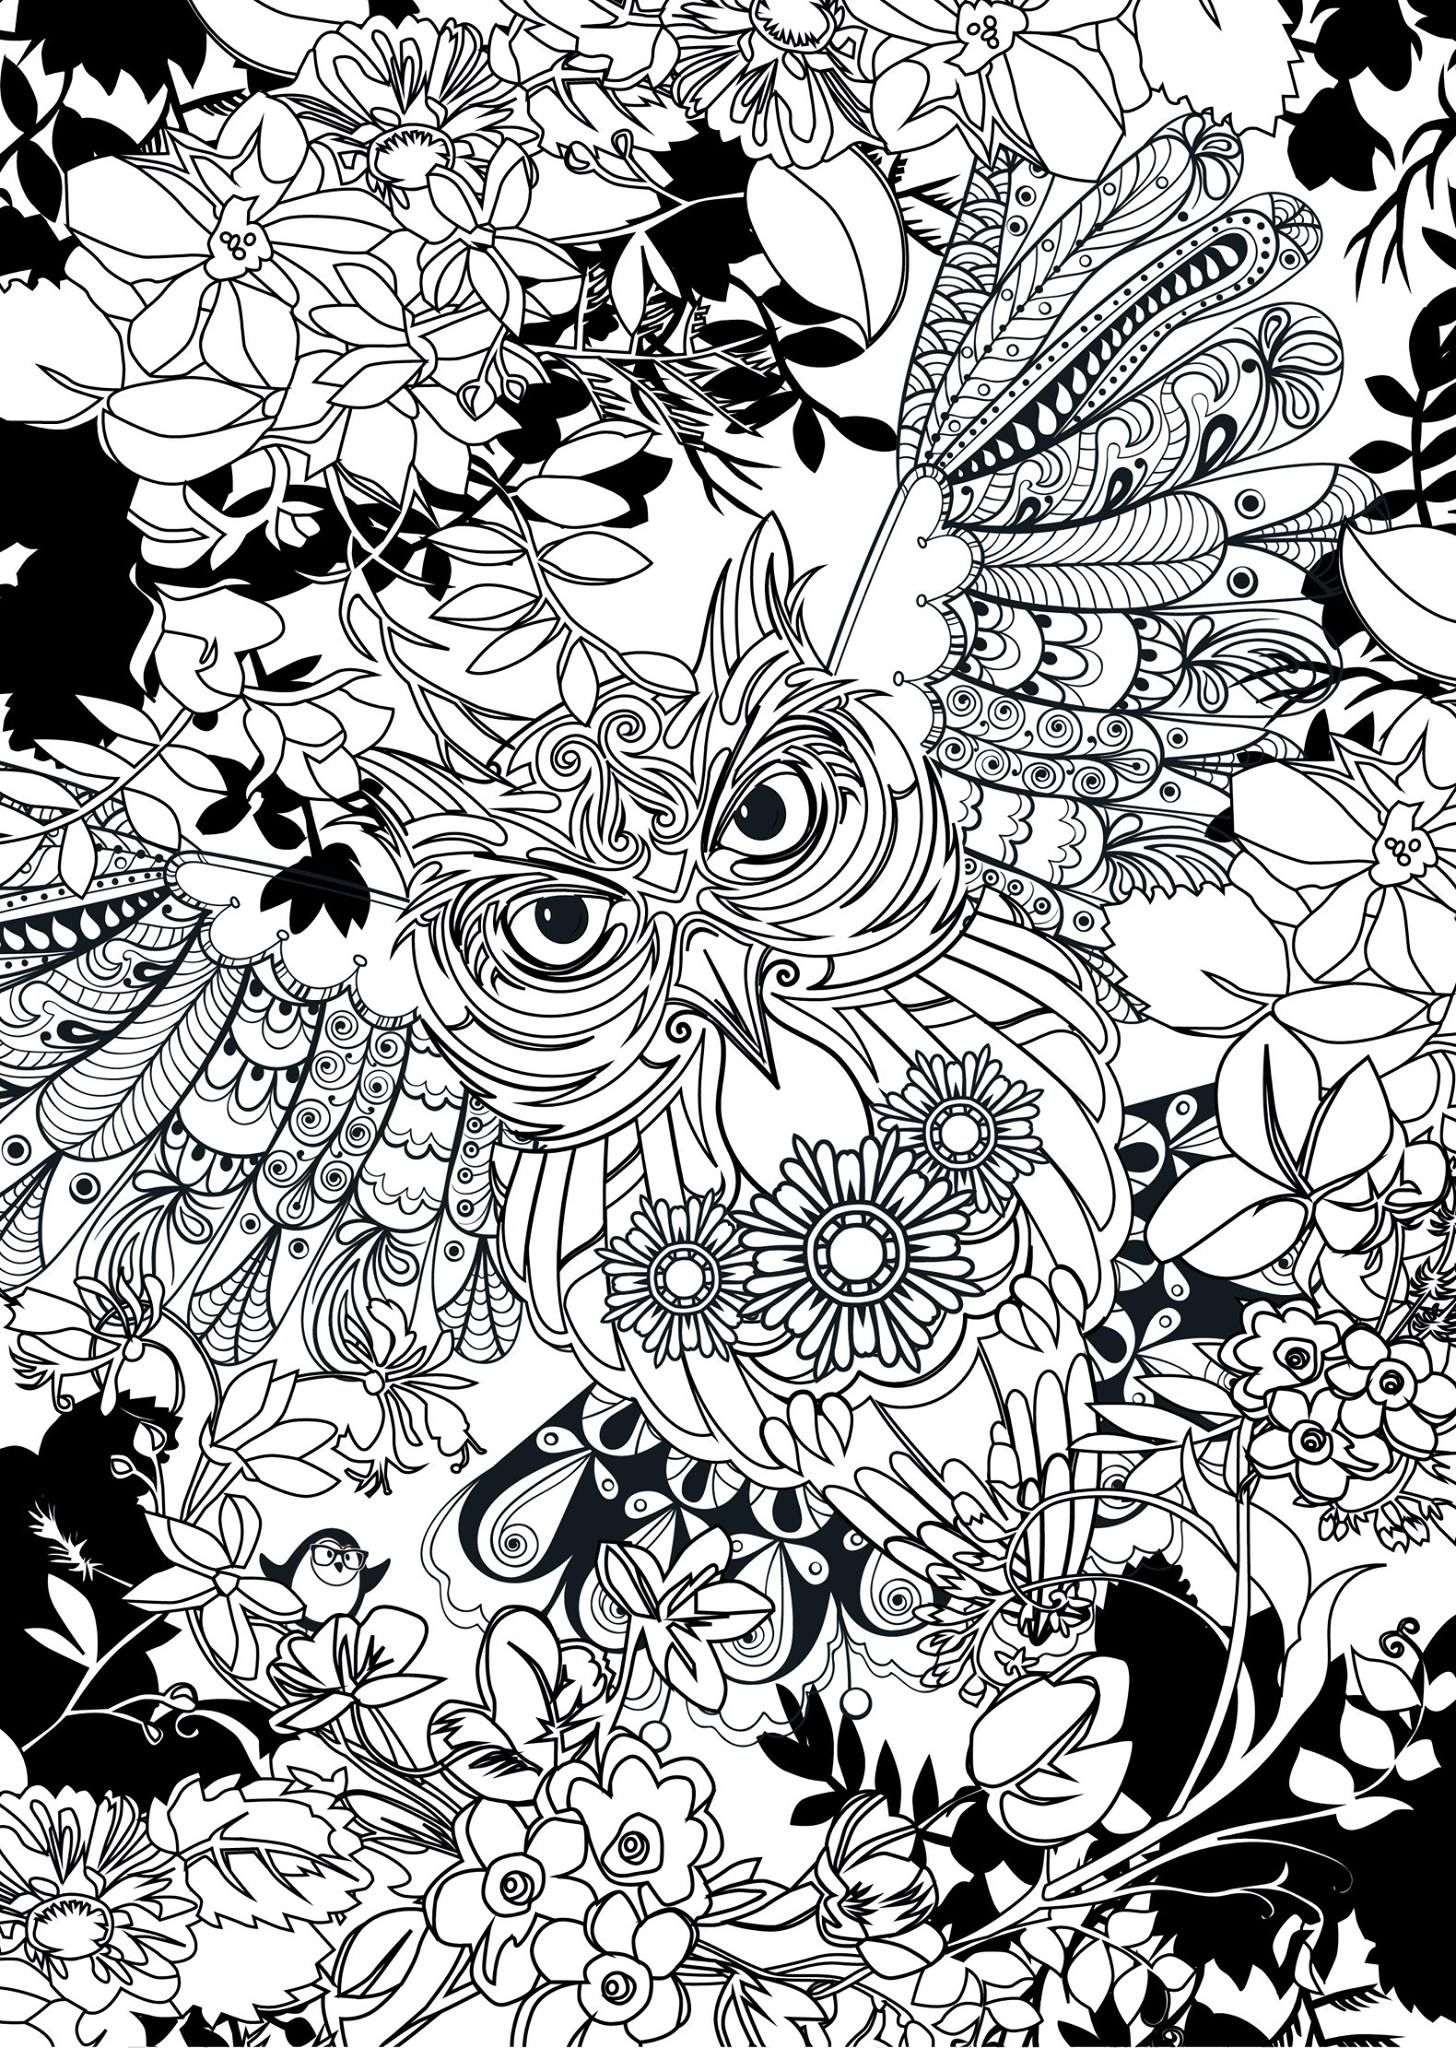 Pin by Bonnie Seter on Owl Ausmalbilder